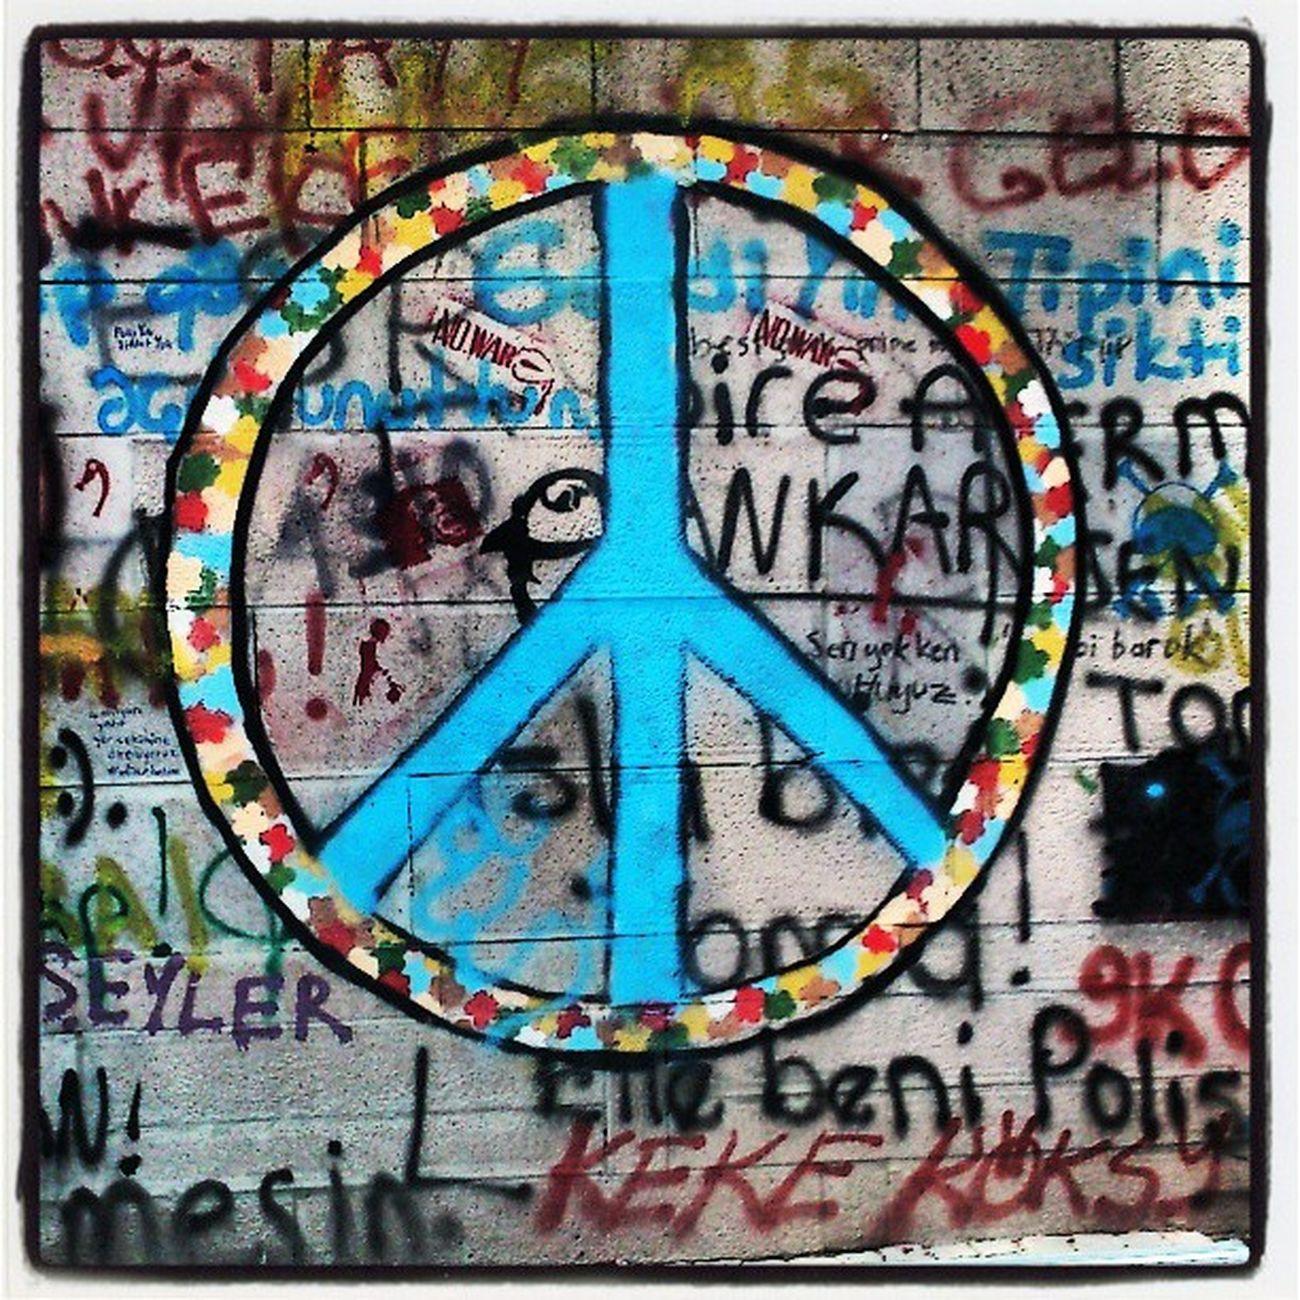 Imagine all the people/ Living life in peace Direnankara Direnkugulu Direngezi